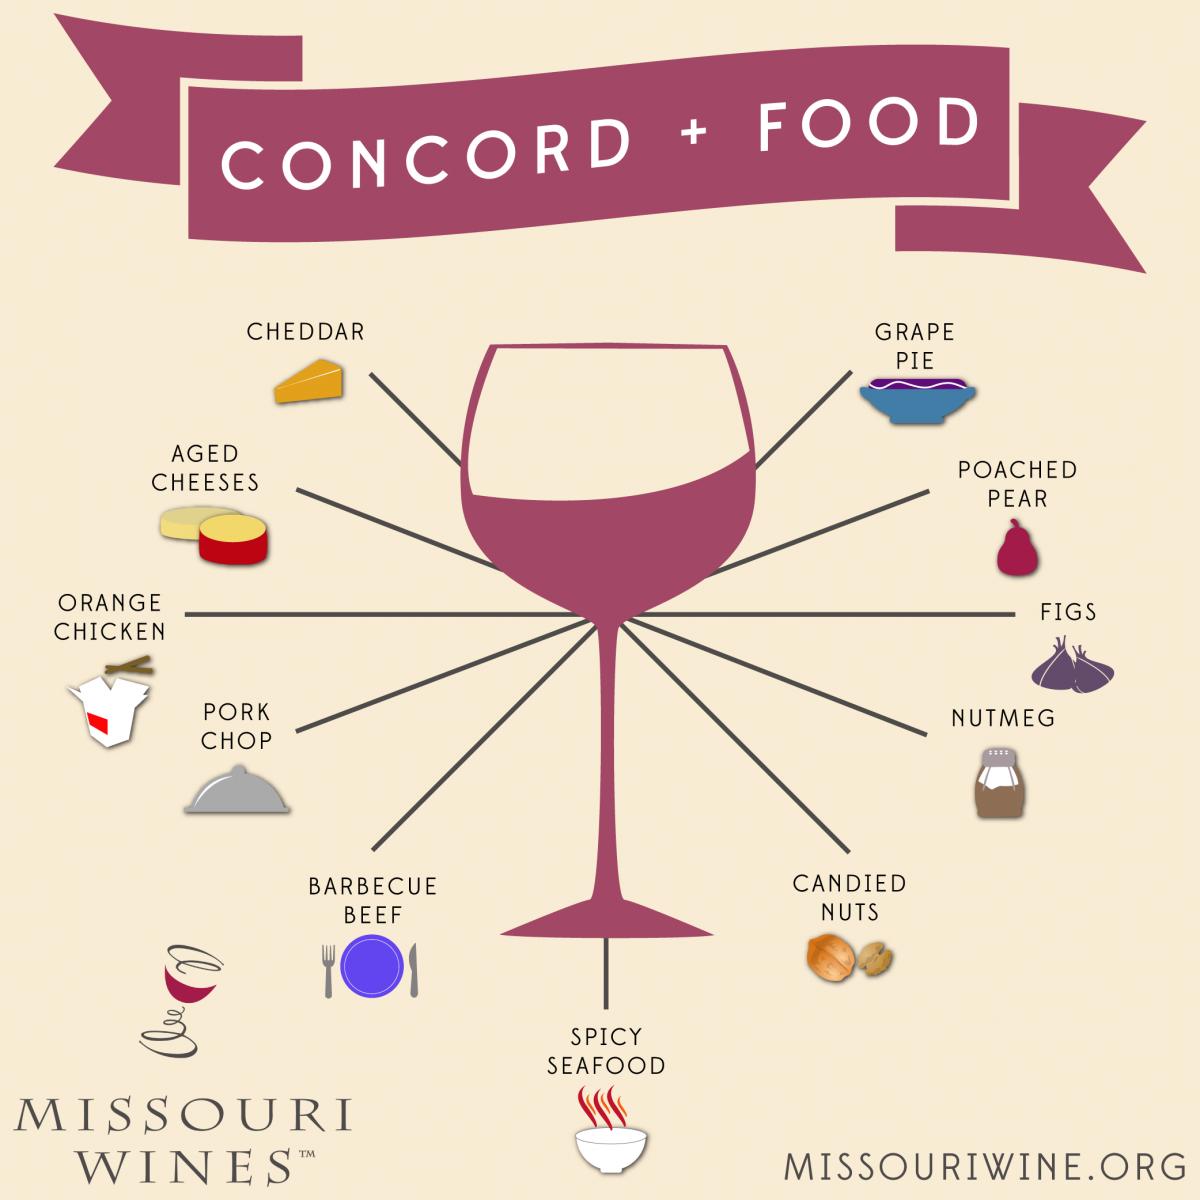 Concord Wine And Food Pairings Wine Food Pairing Food Pairings Concord Wine